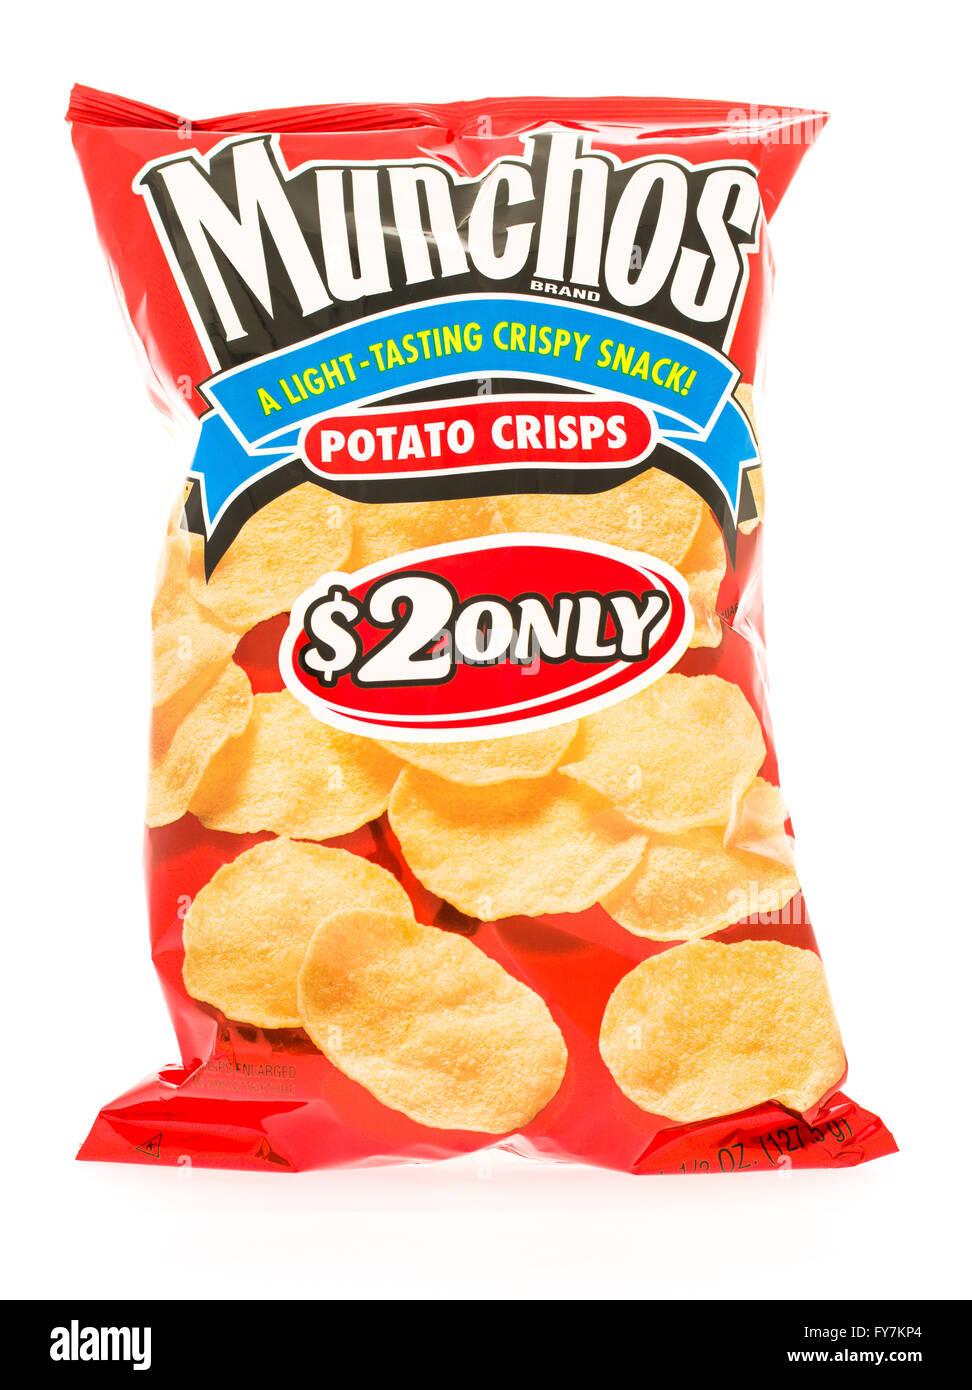 Winneconni, WI - 23 June 2015:  Bag of Munchos potato crisps - Stock Image